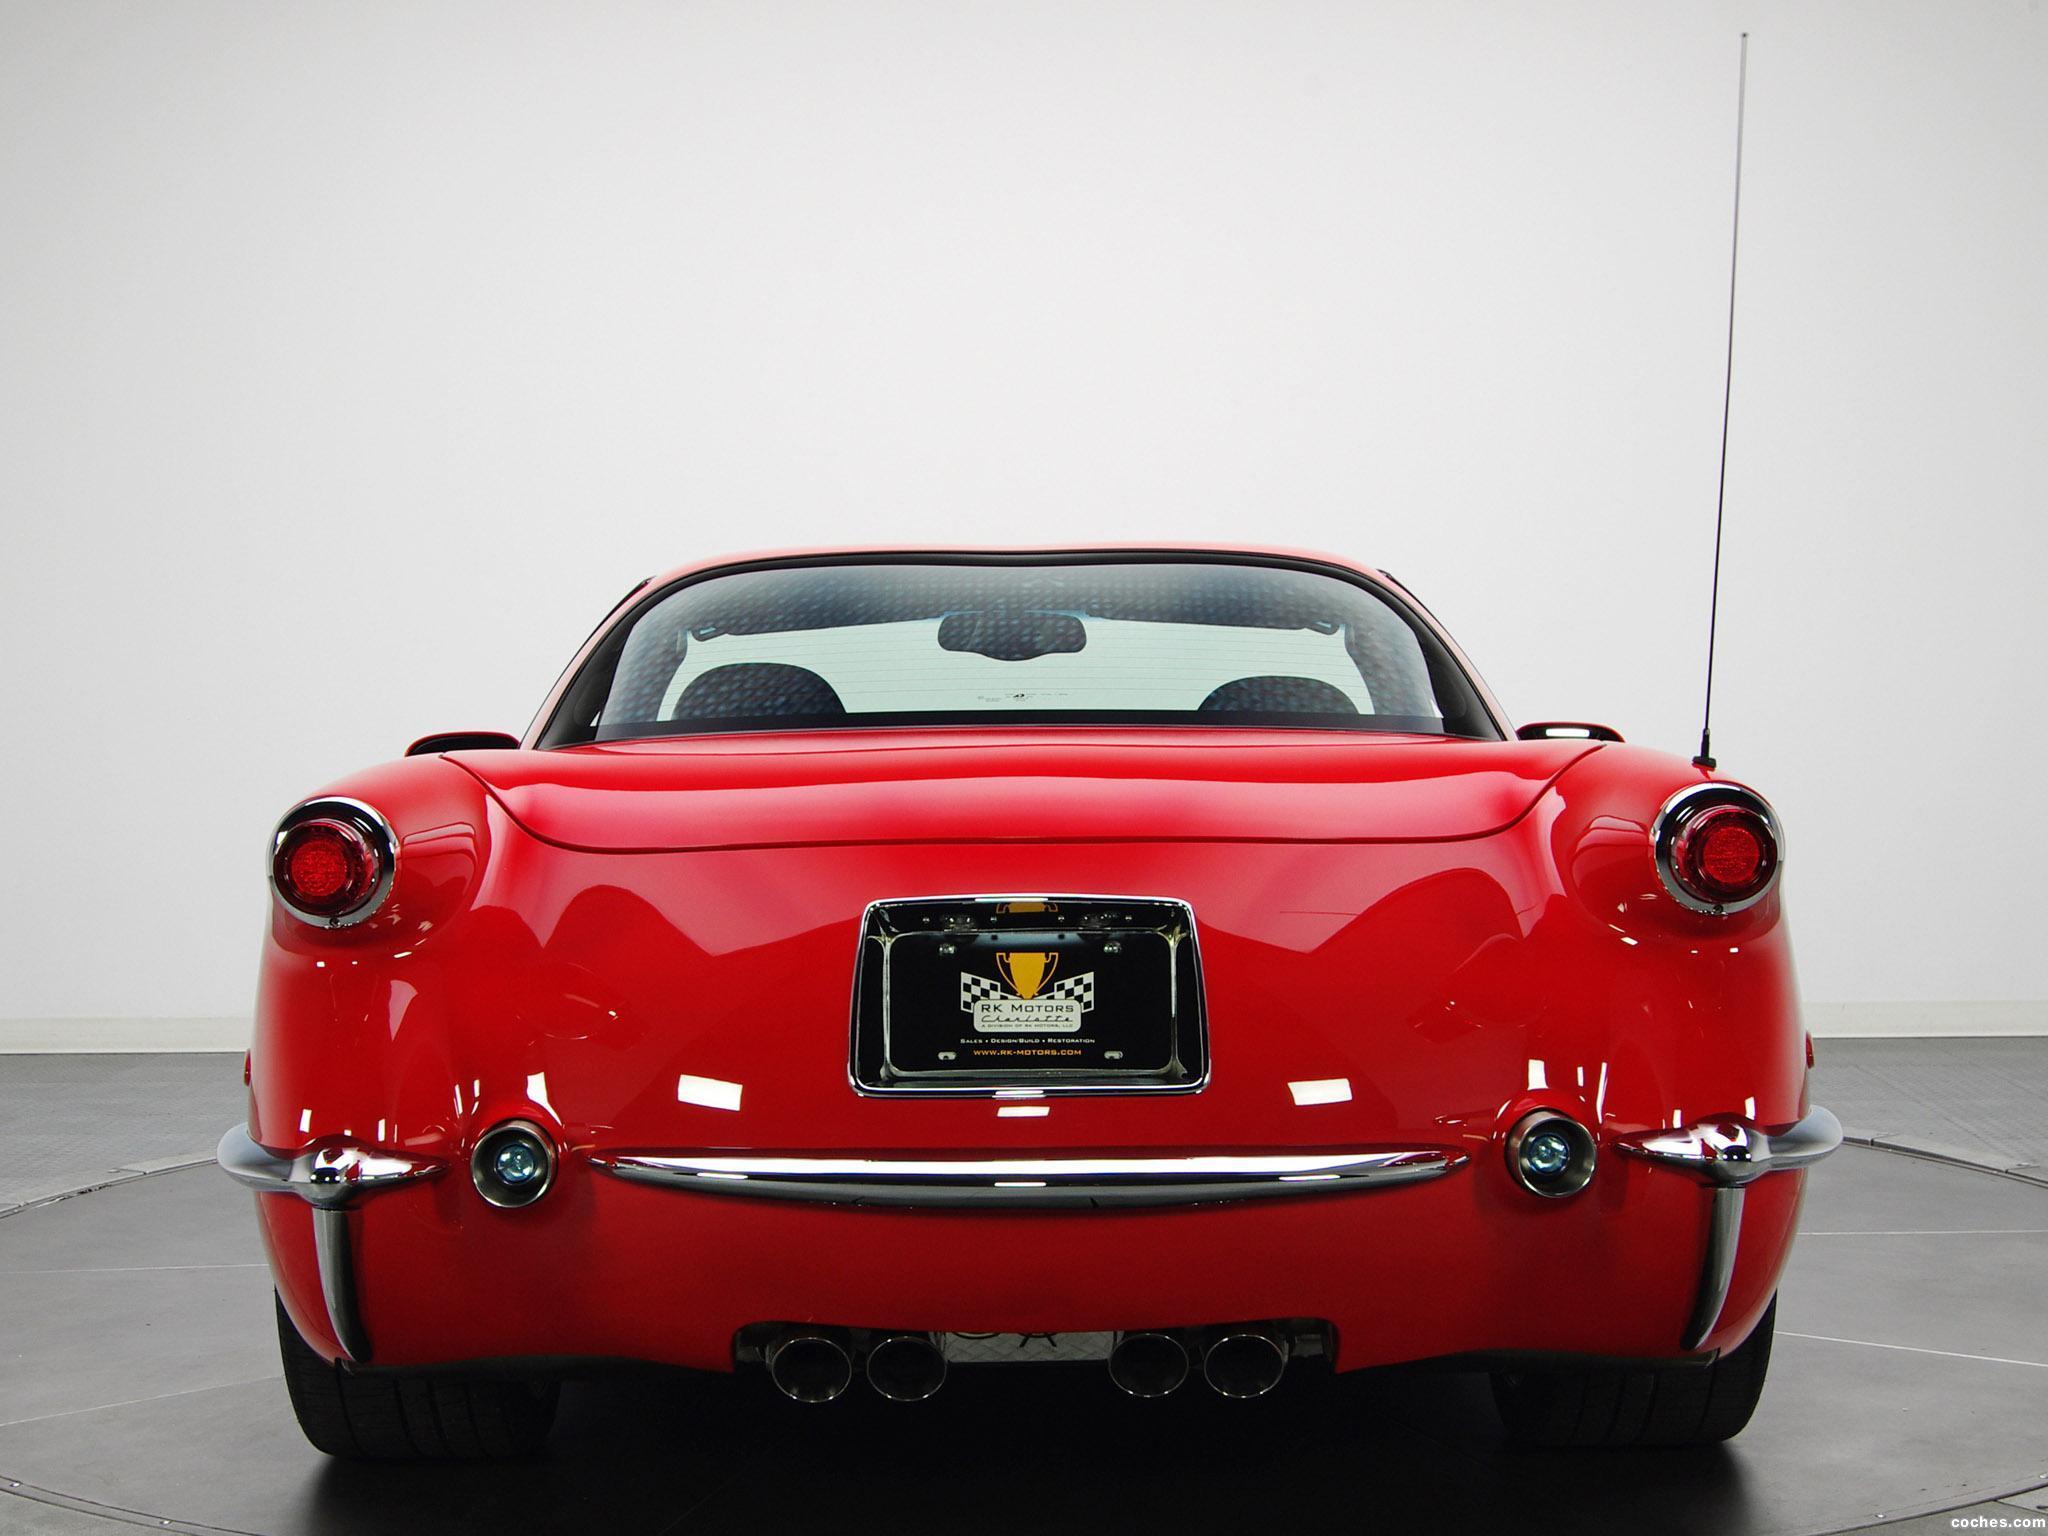 Foto 4 de Chevrolet Corvette C5 Z06 1953 Commemorative Edition 2001